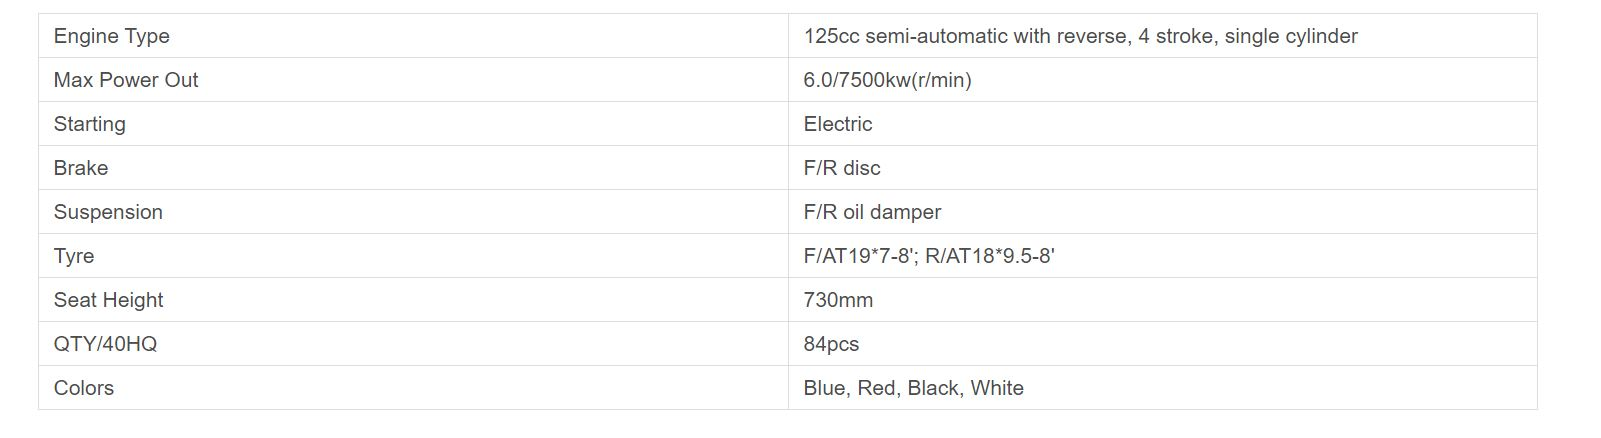 pentora 125 cc features